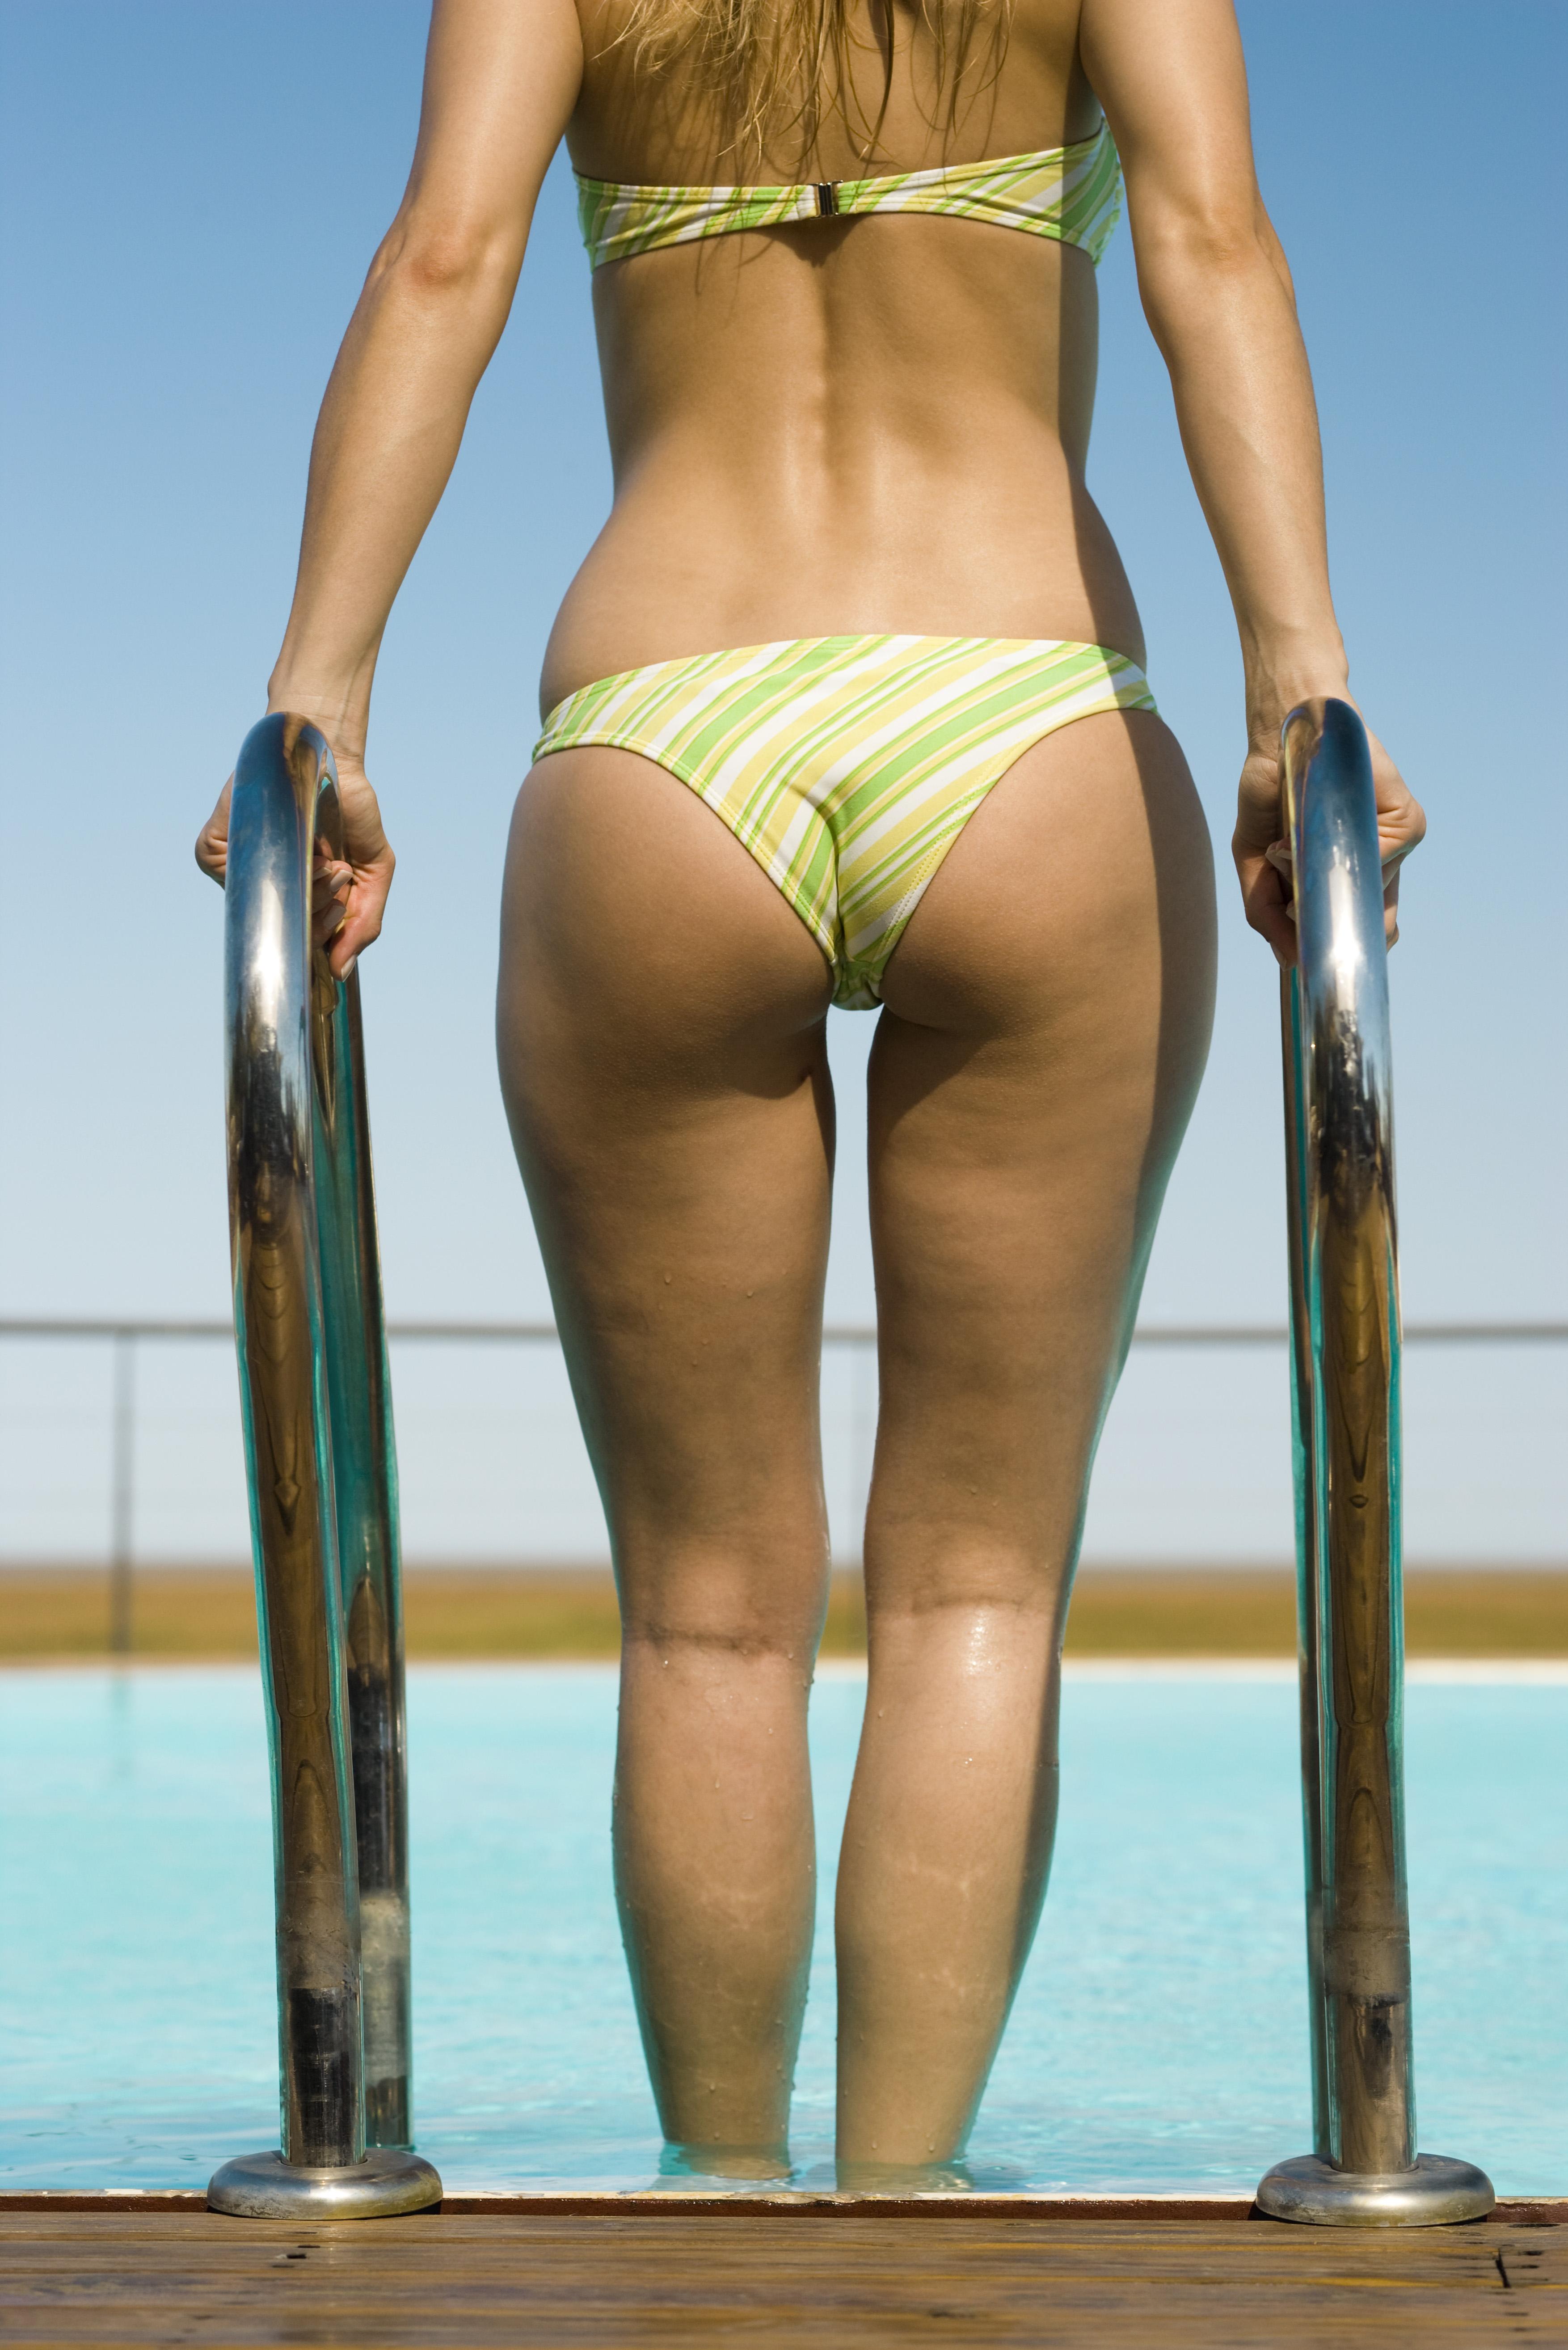 Woman entering swimming pool, rear view